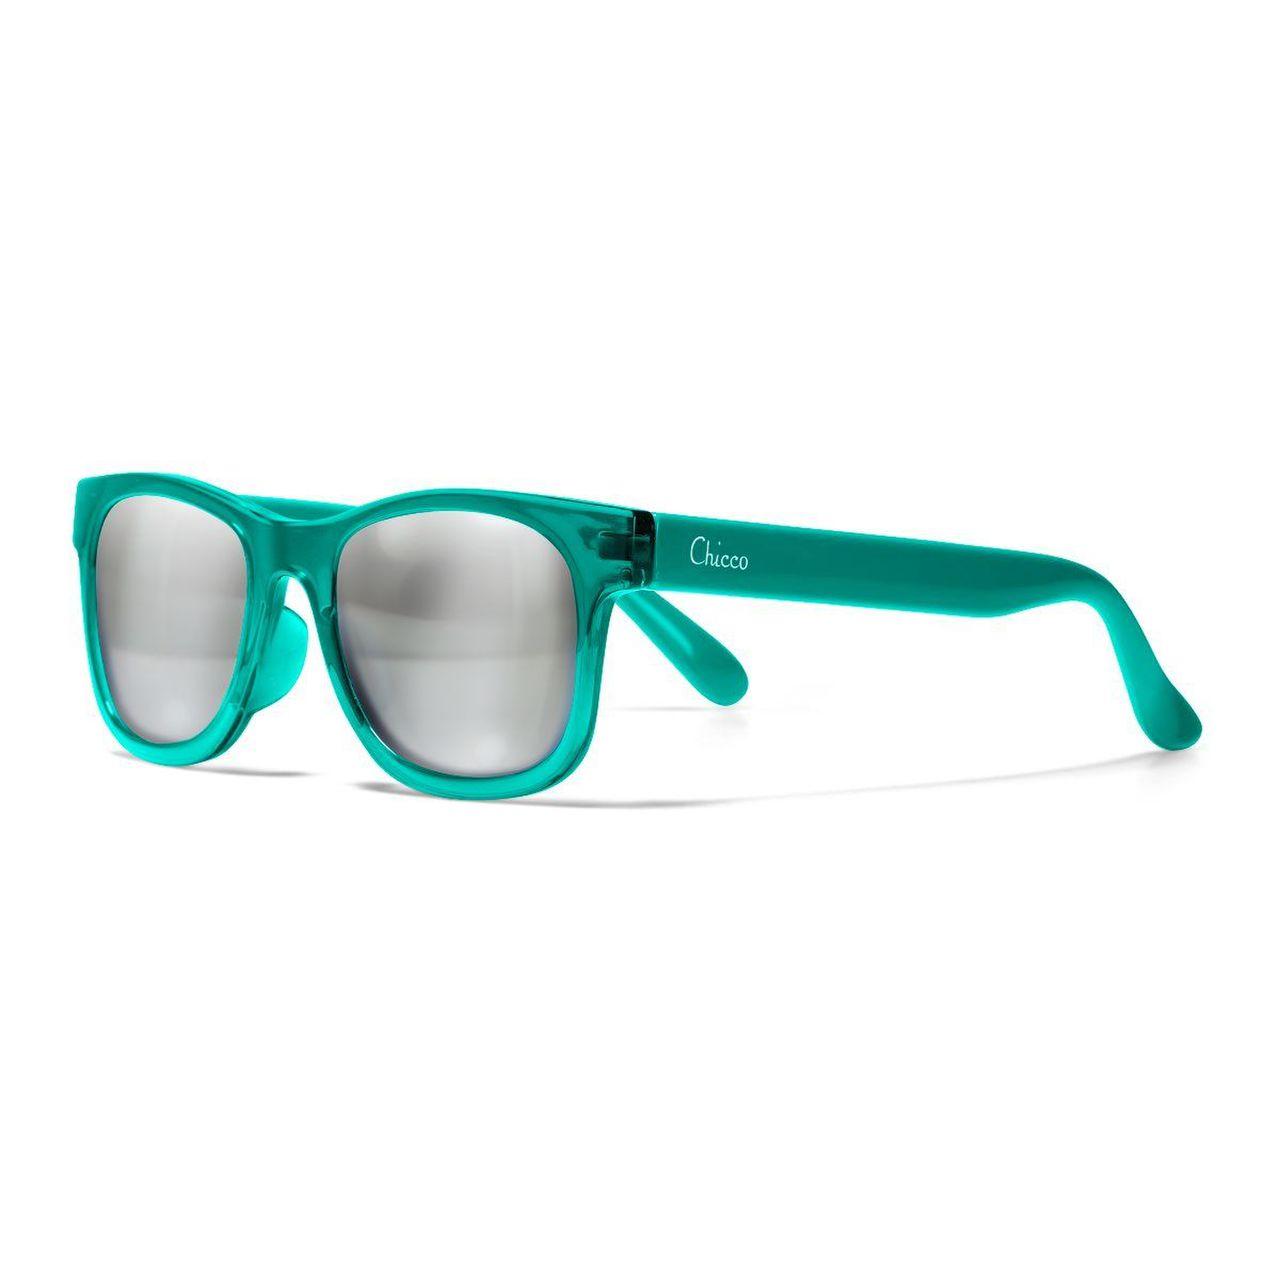 CHICCO Okuliare slnečné chlapec zelené transparent 24m+